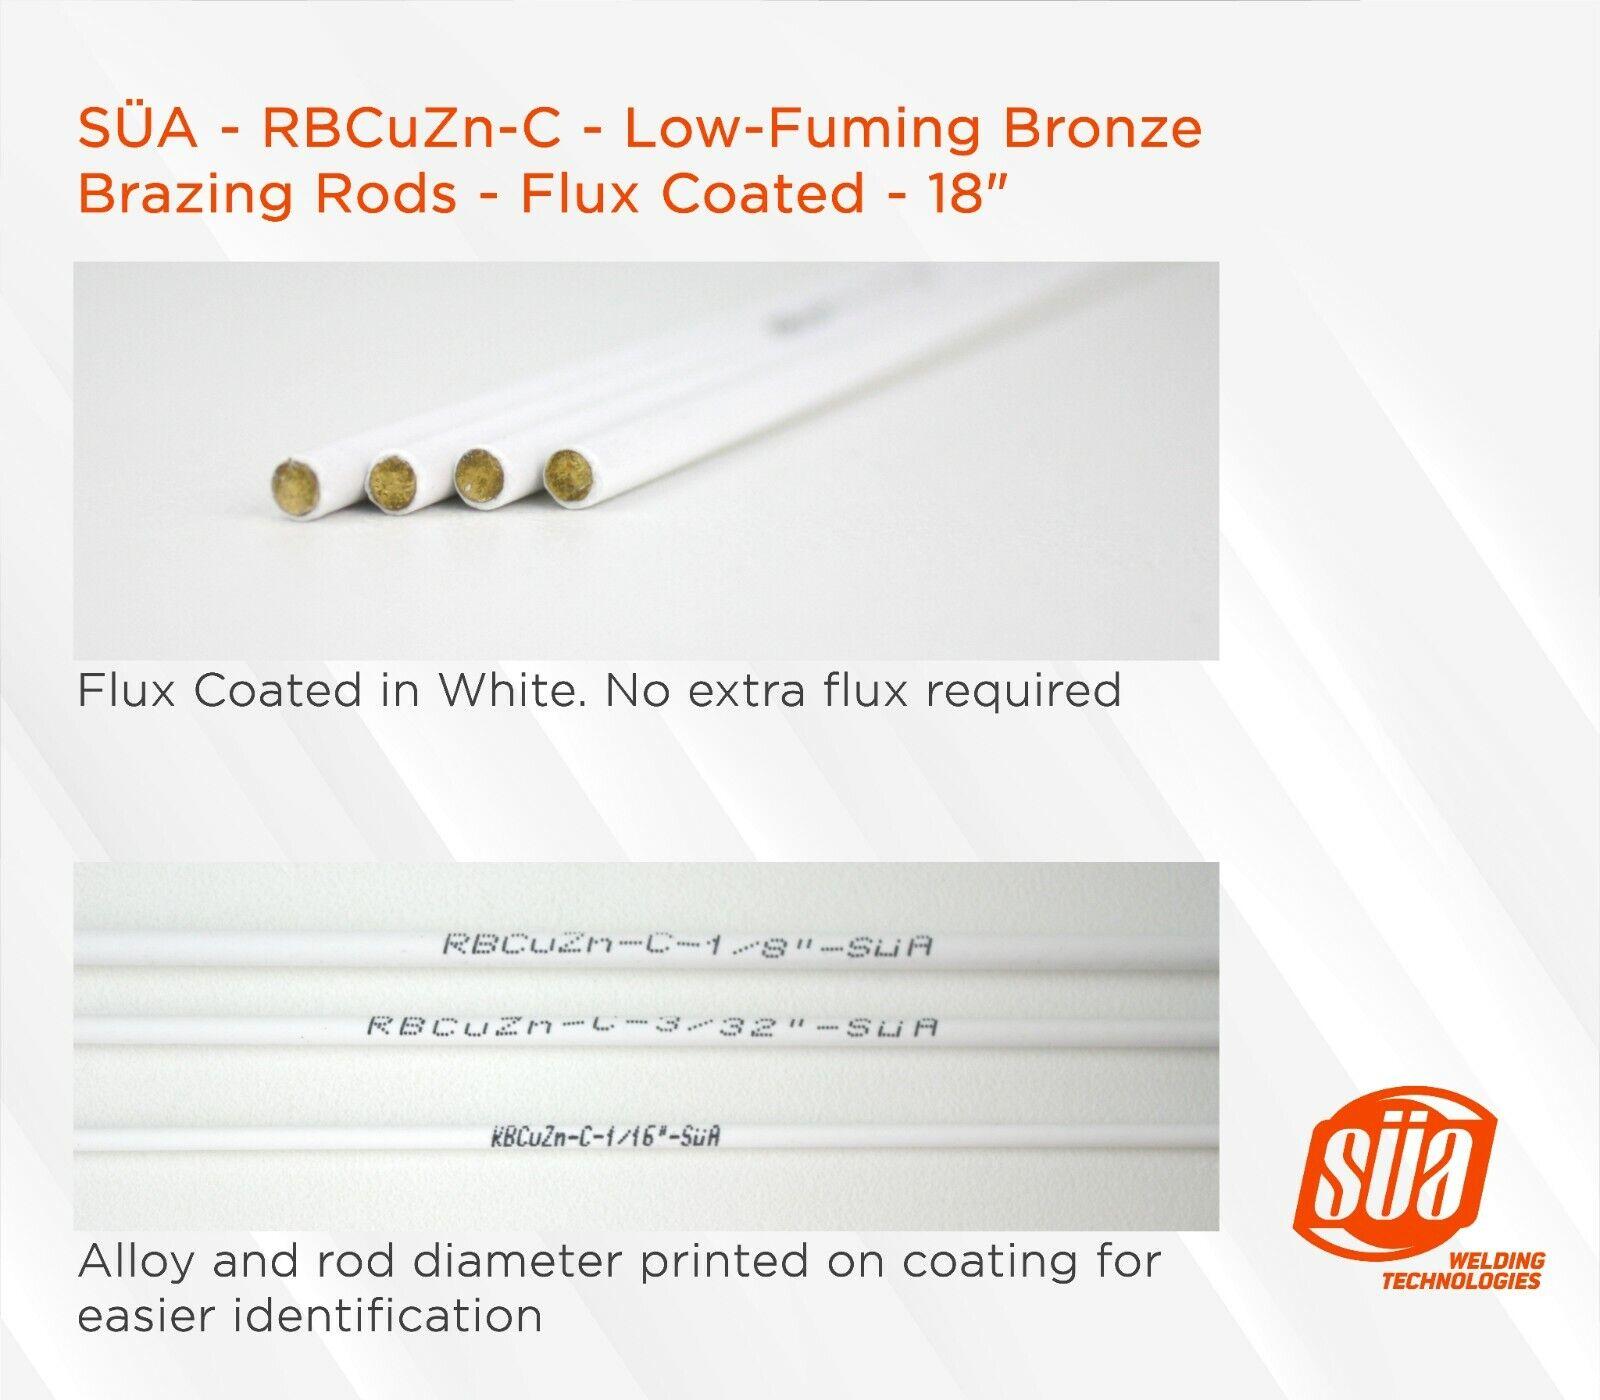 LFB Flux Coated Bronze Brazing Rod RBCuZn-C 39 x 1//16 1 Lb